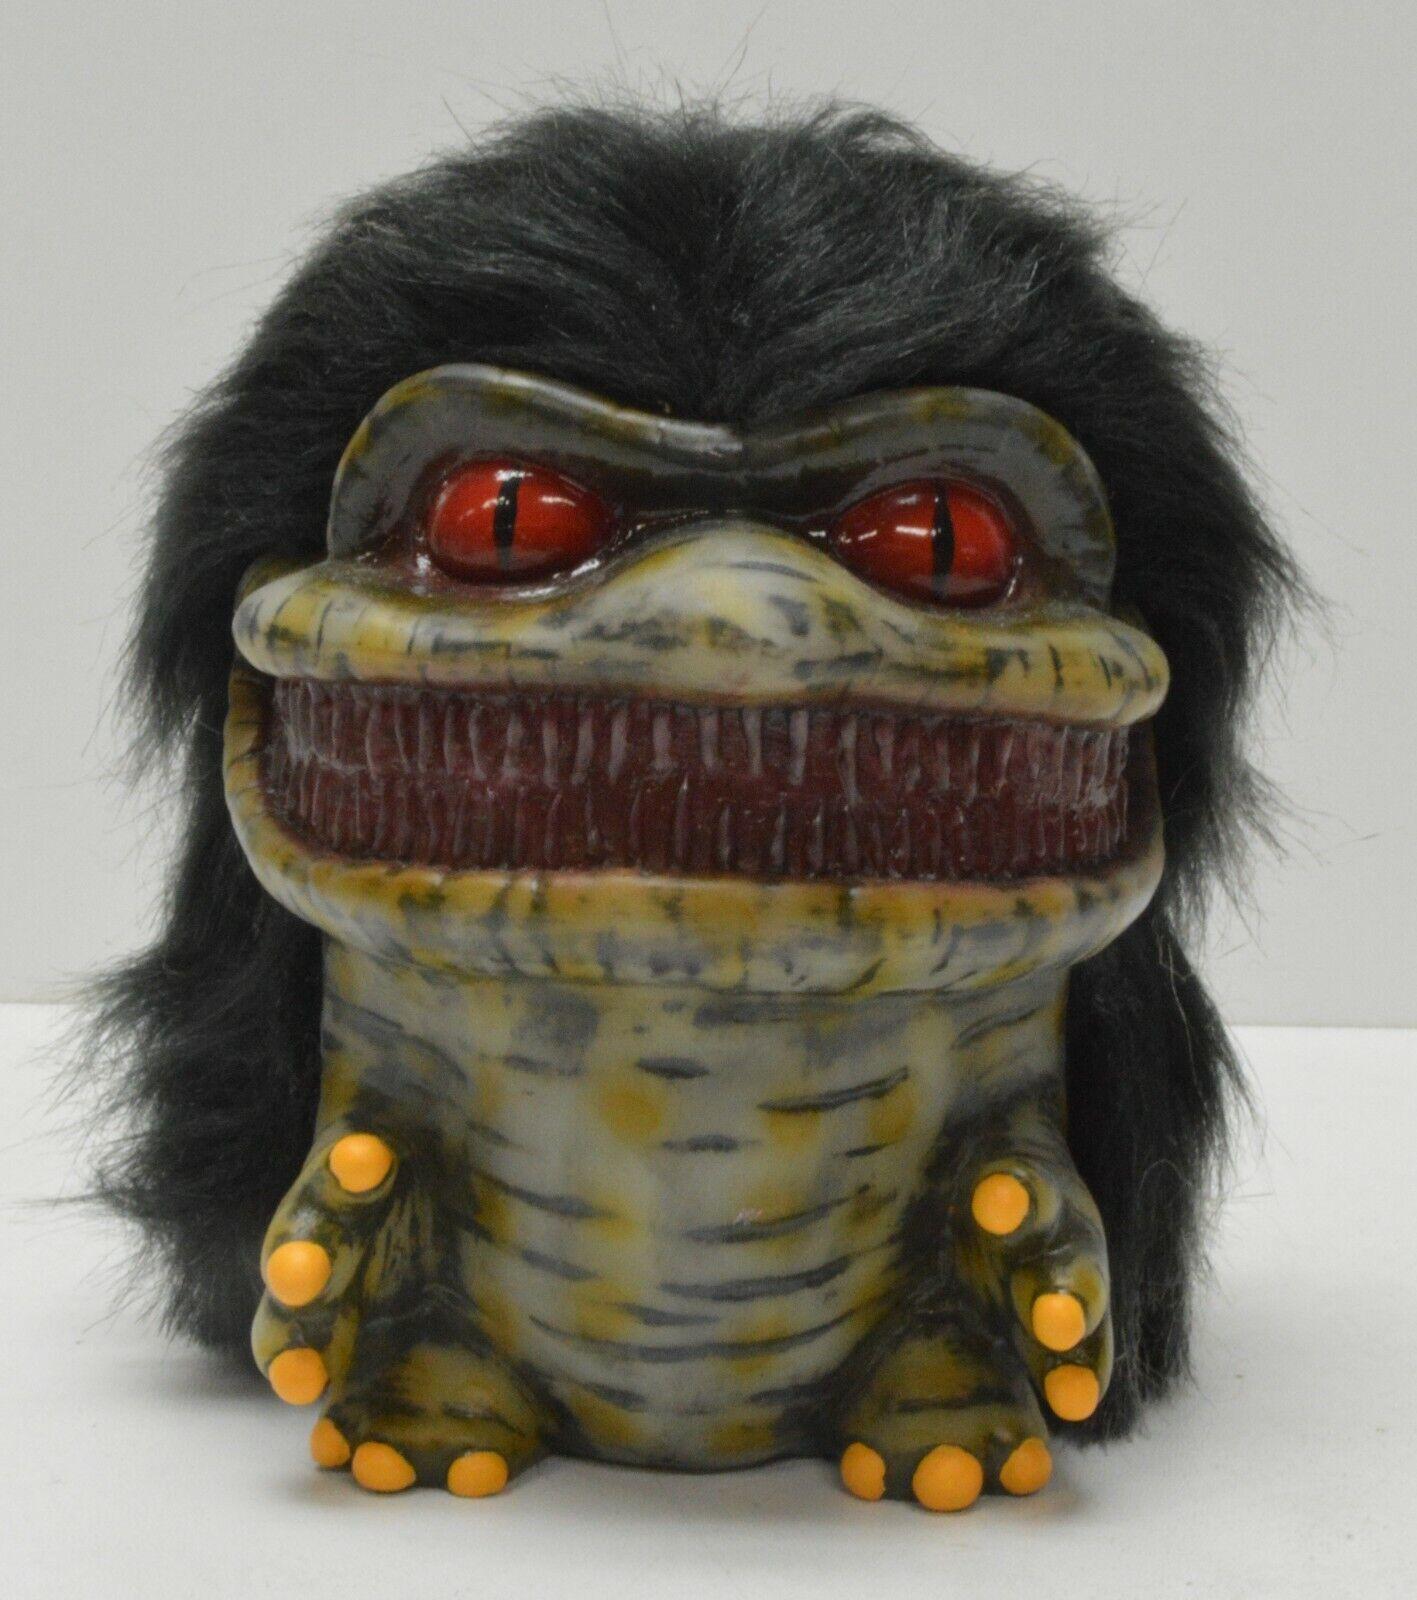 Monstarz Critters Space Crite Collectors Vinyl Figure Toy version 1 NIP